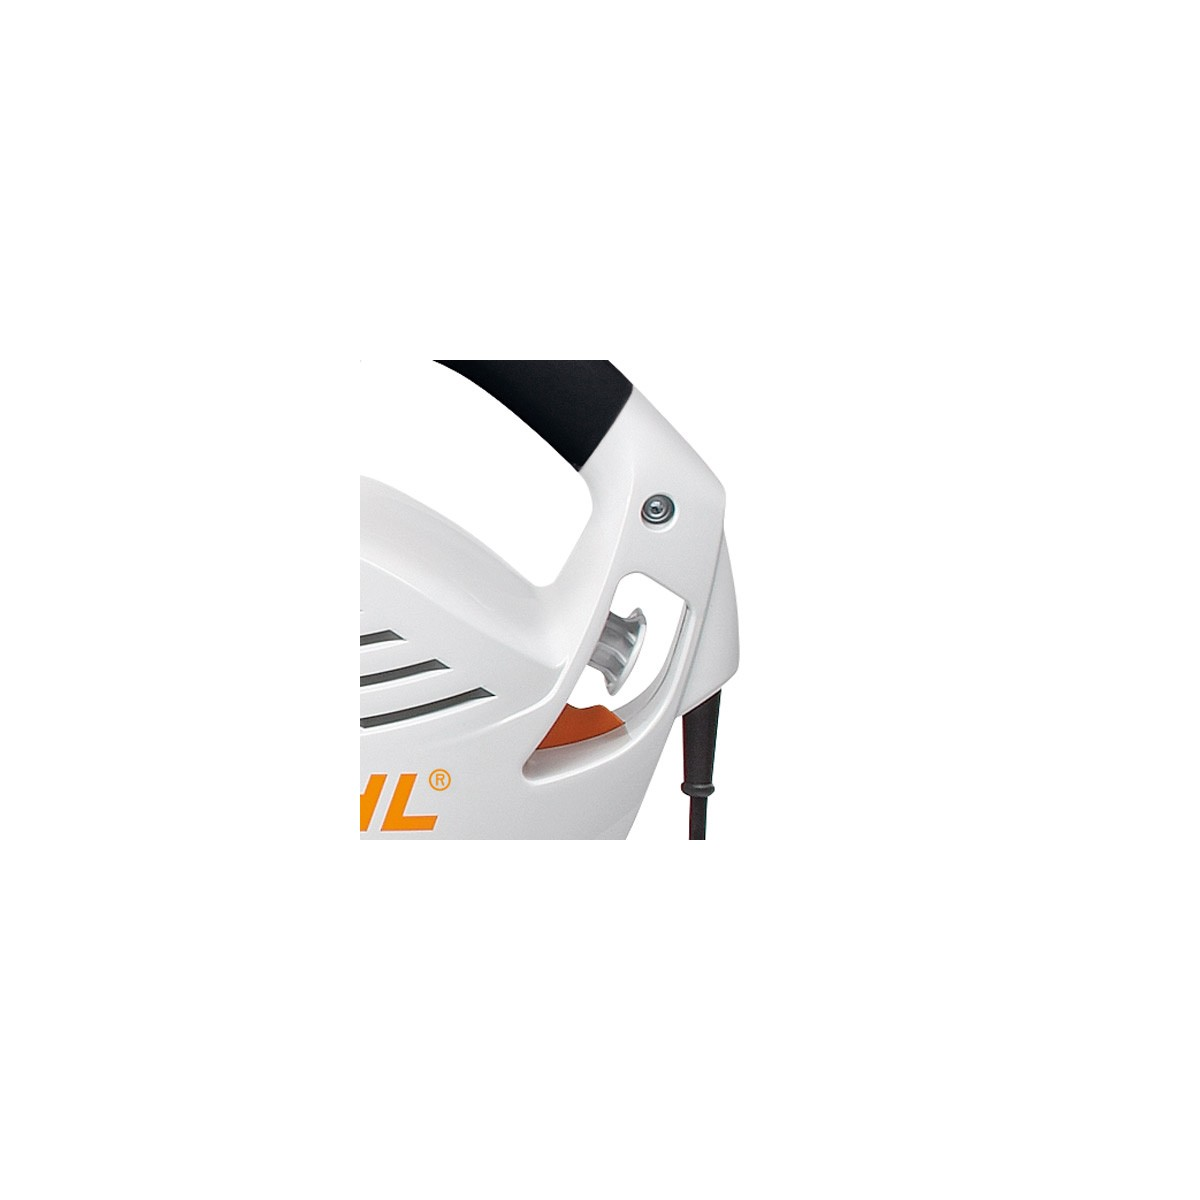 achat aspiro souffleur stihl electrique she 81 stihl bender motoculture